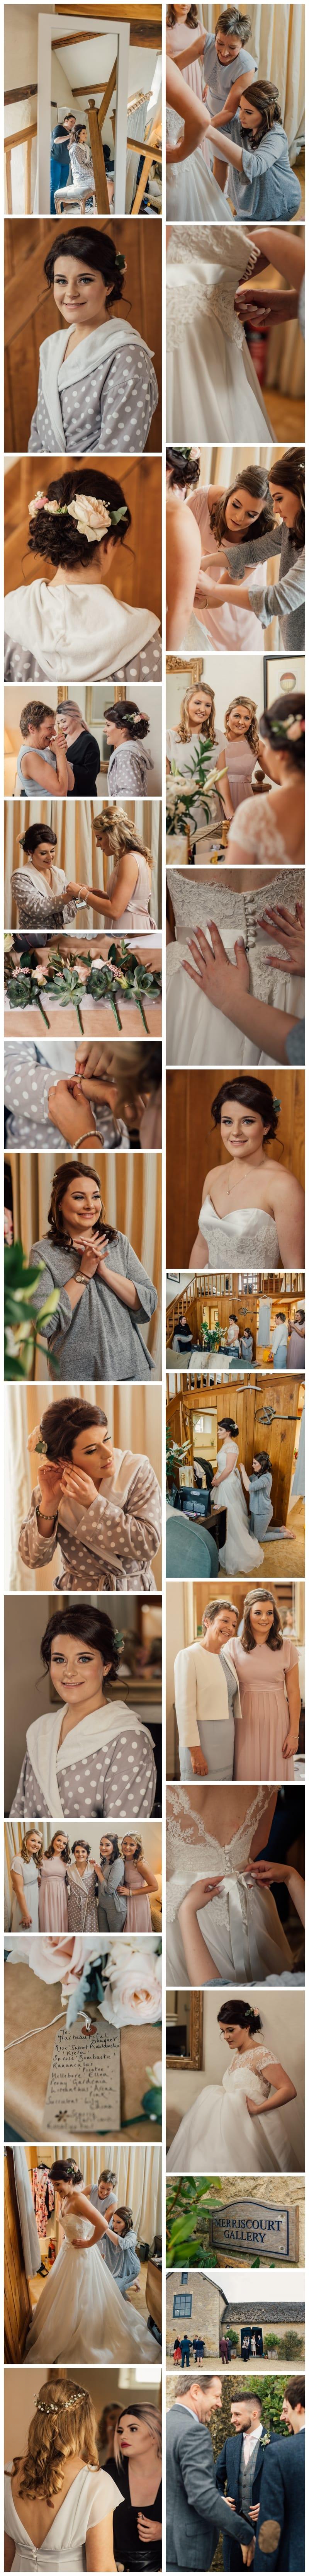 Bridal Prep Merriscourt